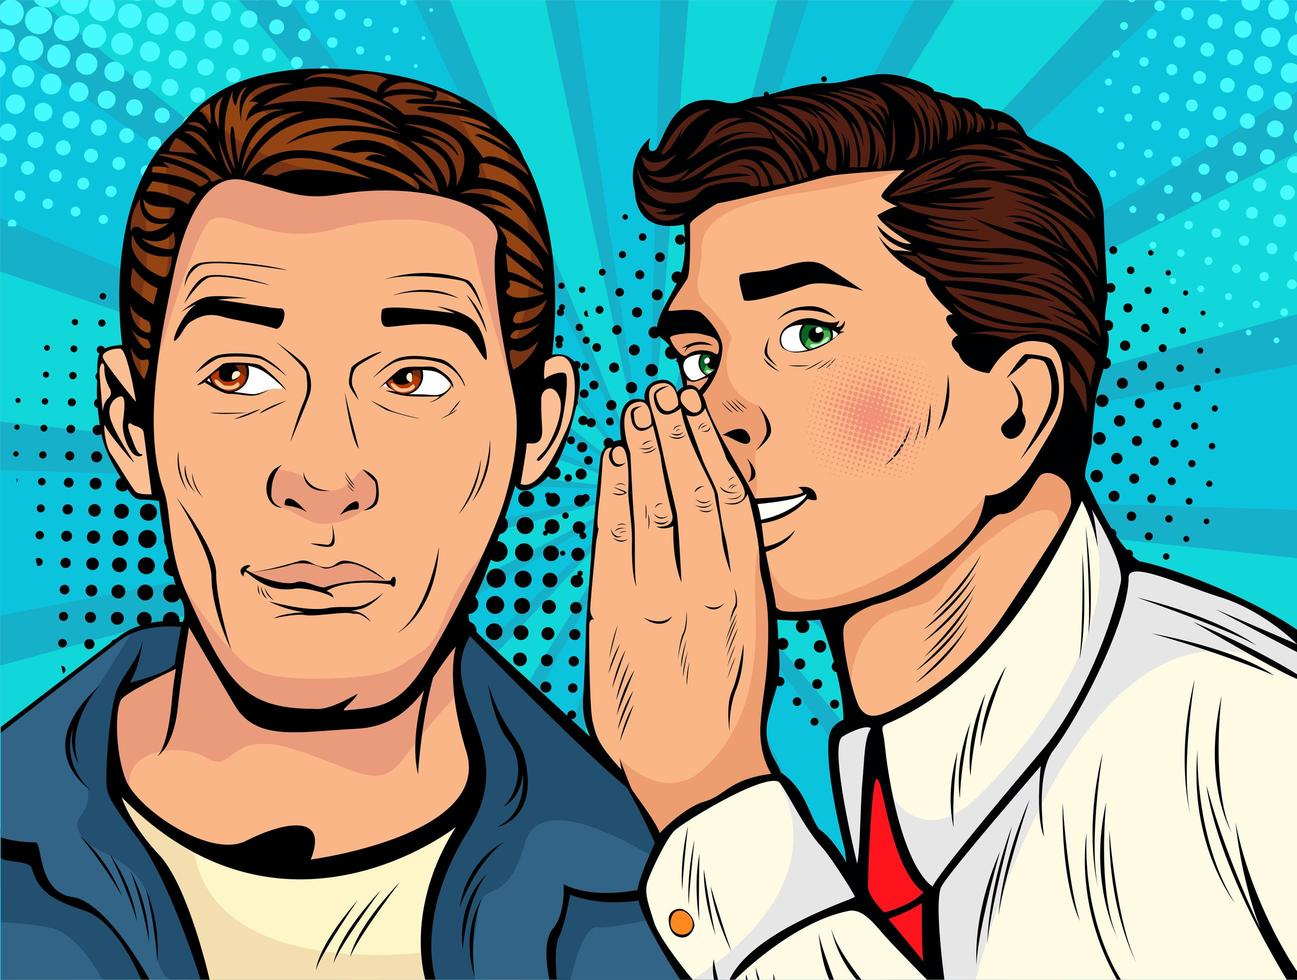 Man whispering gossip or secret to his friend vecteur